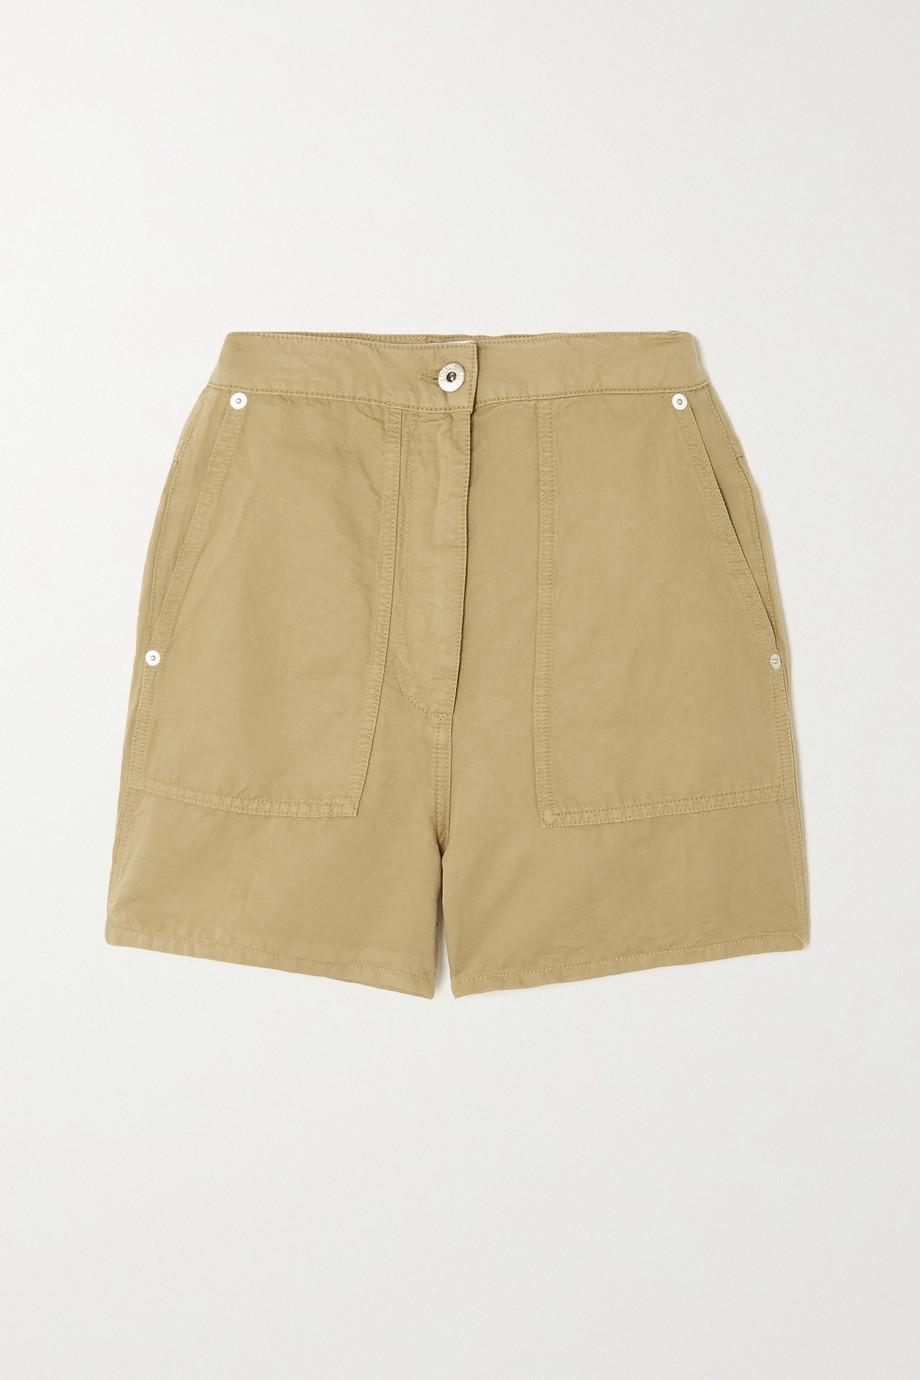 Loewe Short en lin et coton mélangés x Paula's Ibiza